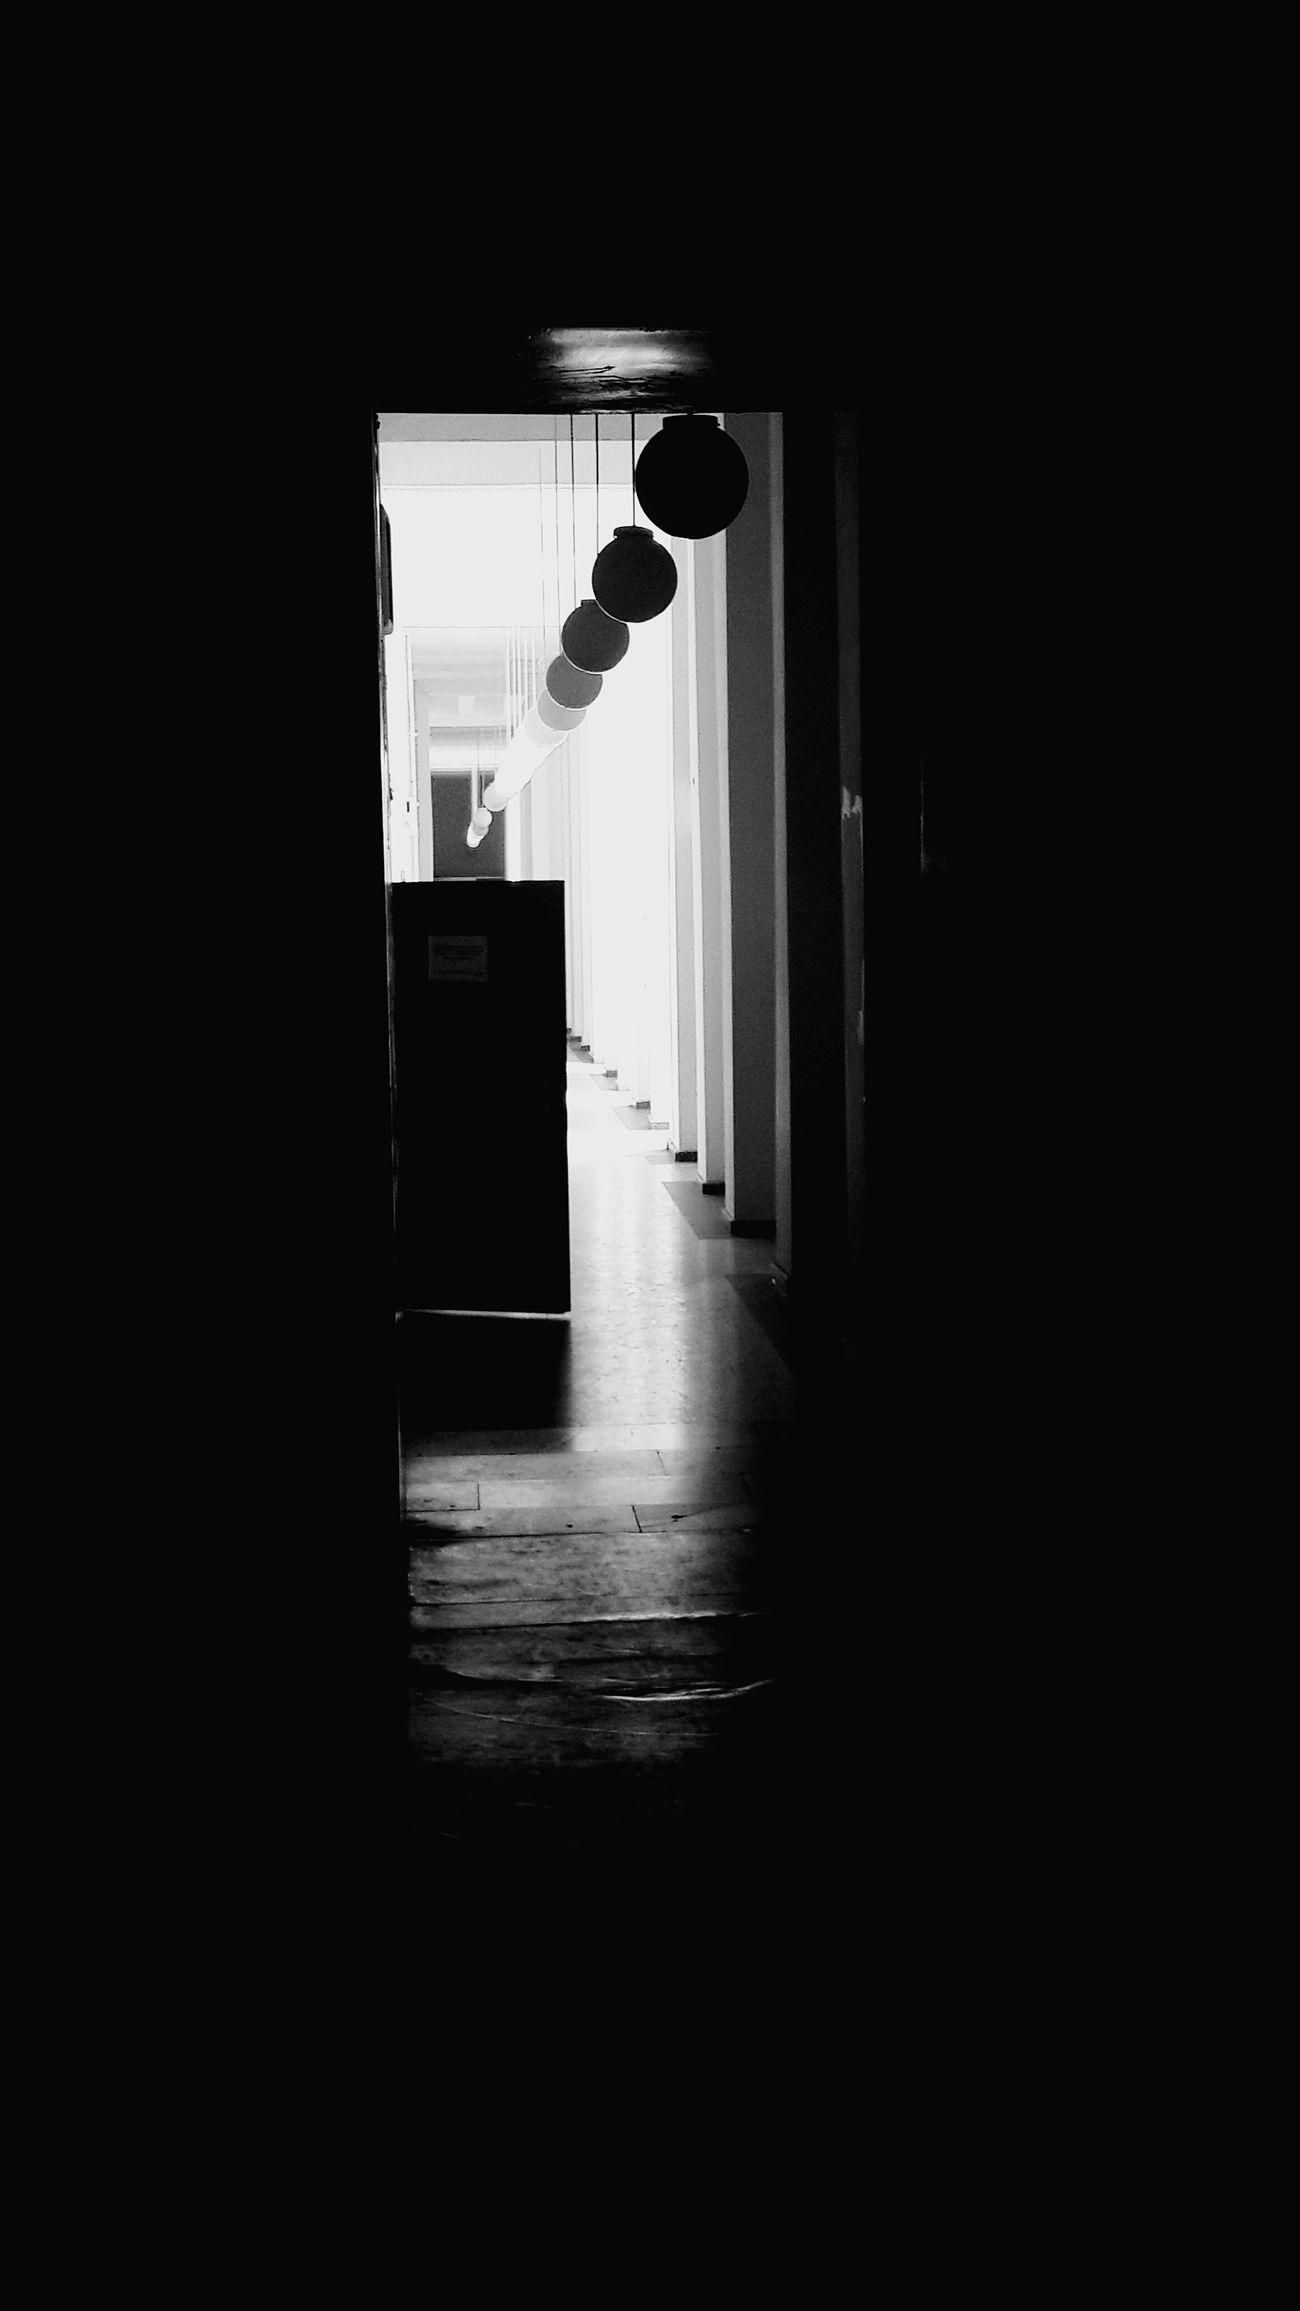 👣💀MSGSU Mimarsinanuniversity Mimarsinanguzelsanatlaruniversitesi Darkness And Light Blackandwhite Door Lamp Vscocam Photography Istanbul Turkey